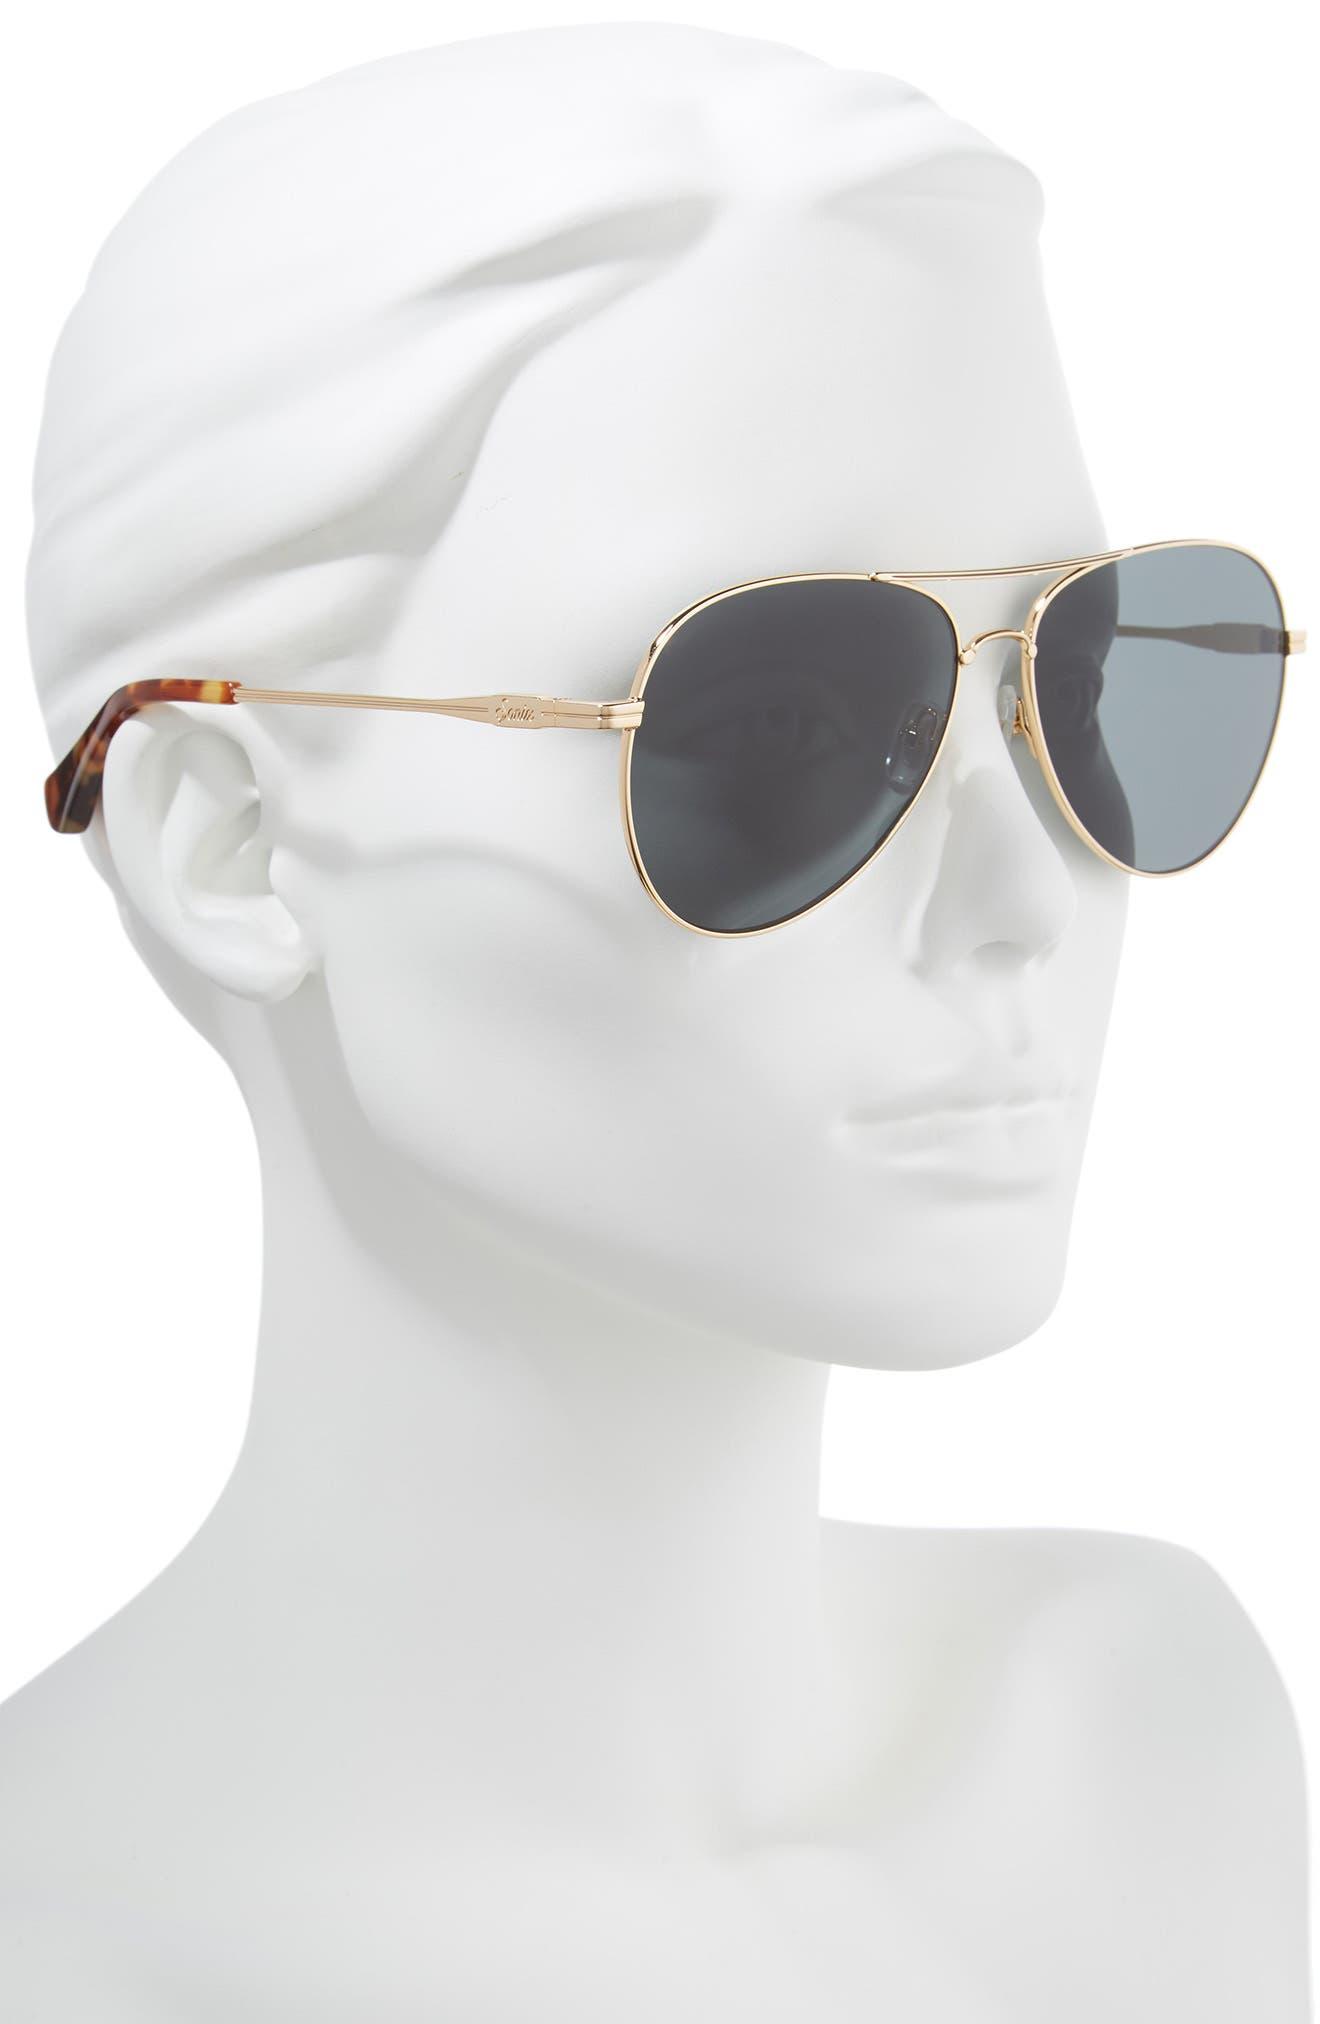 Lodi 61mm Mirrored Aviator Sunglasses,                             Alternate thumbnail 2, color,                             714